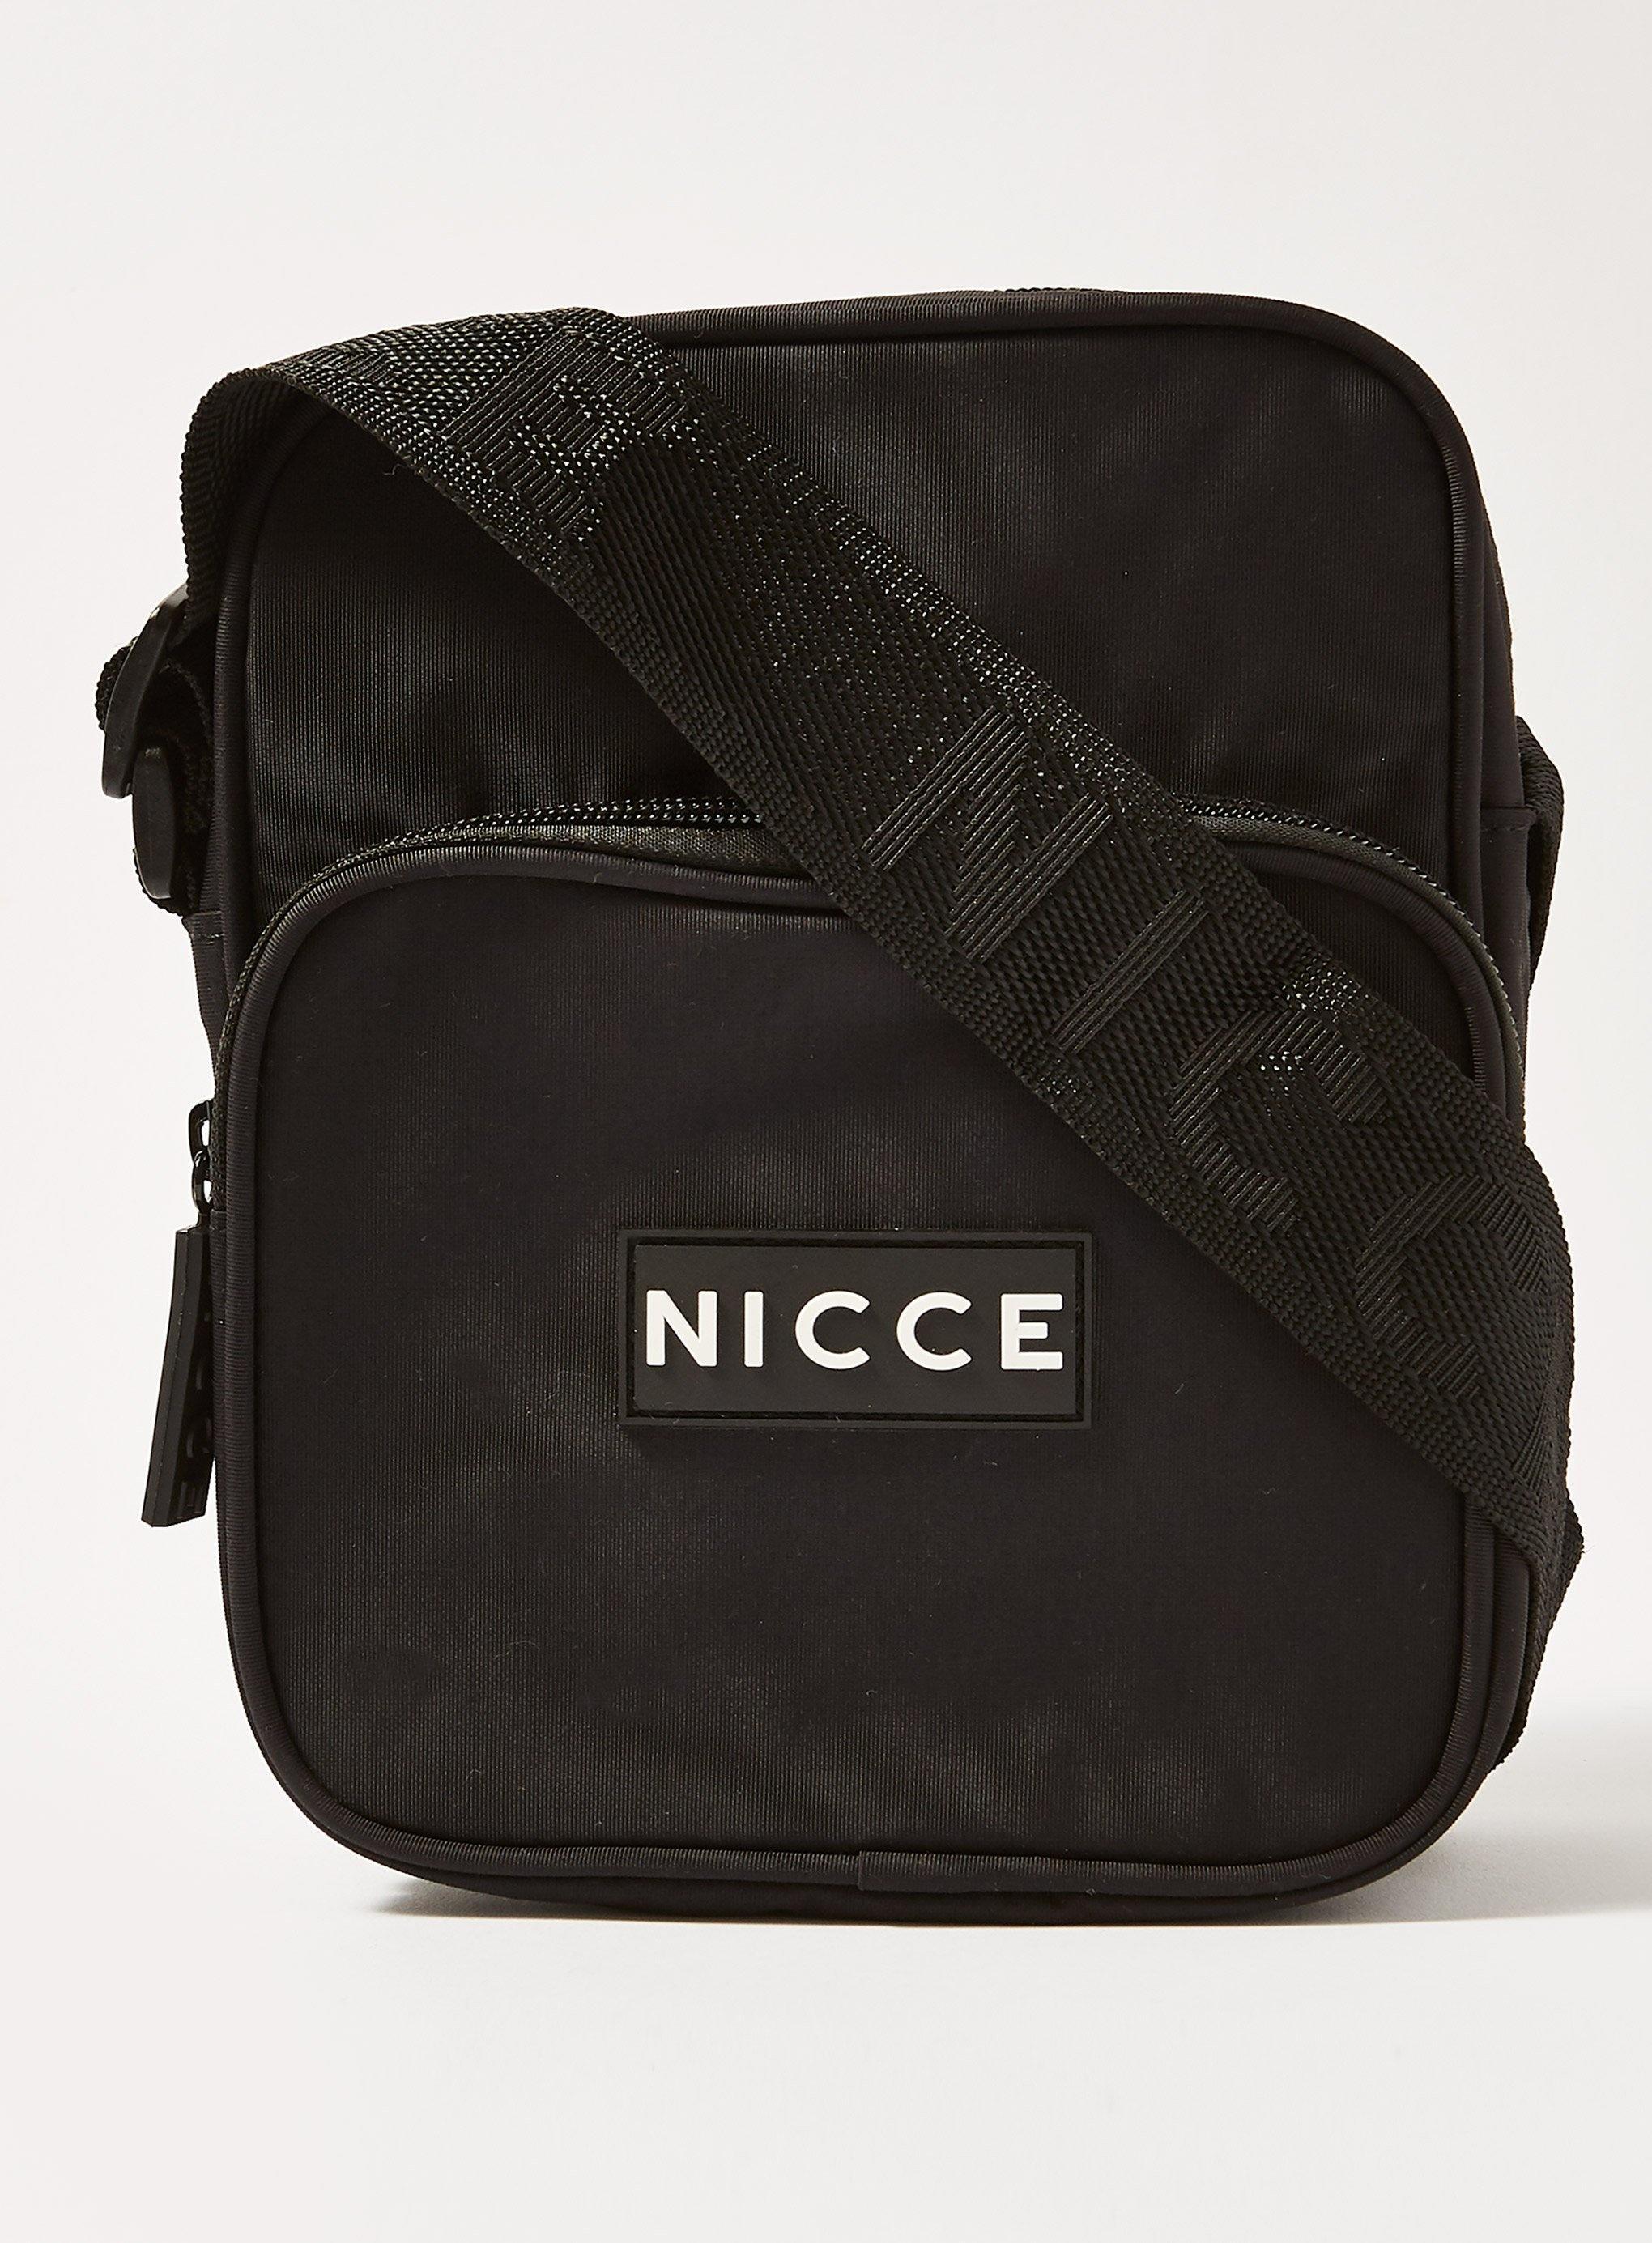 Lyst - Nicce London  timo  Flight Cross Body Bag in Black for Men 003866b5c6ad5